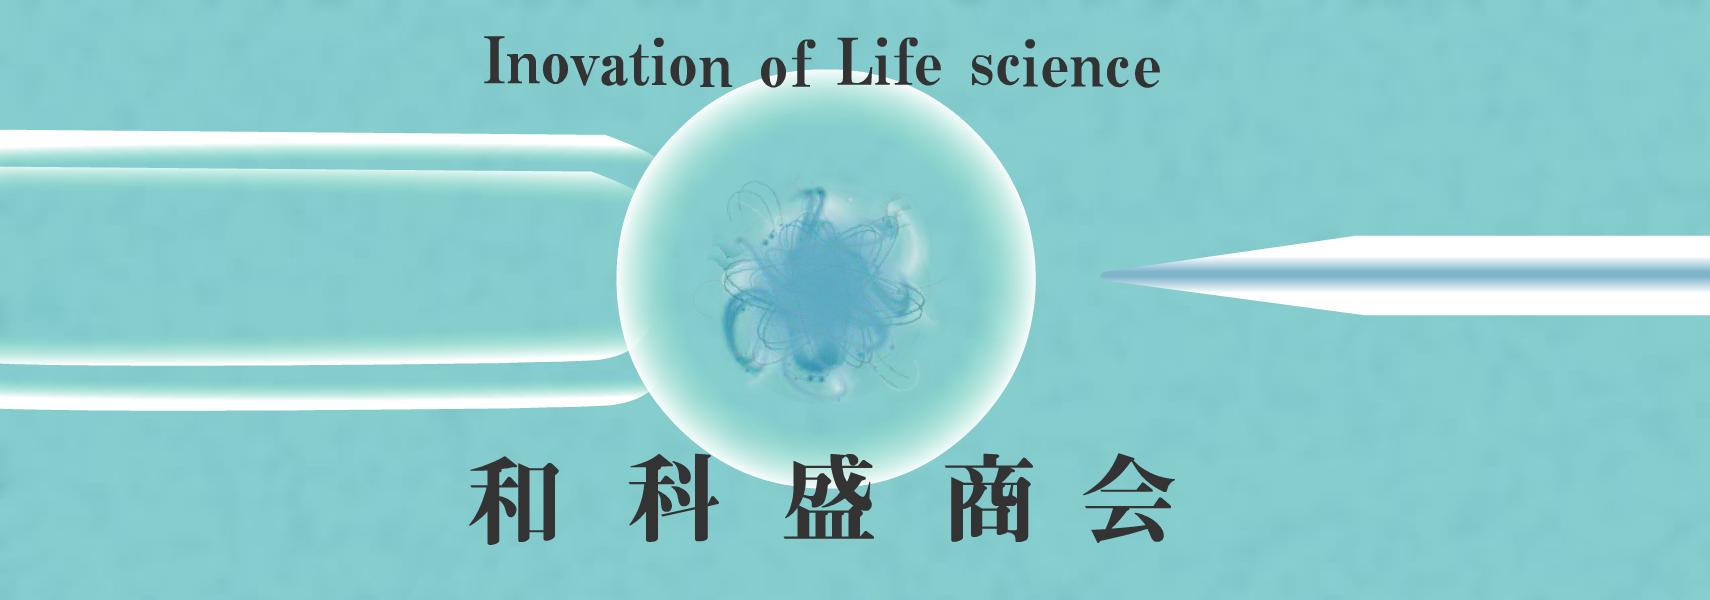 Inovation of Life science